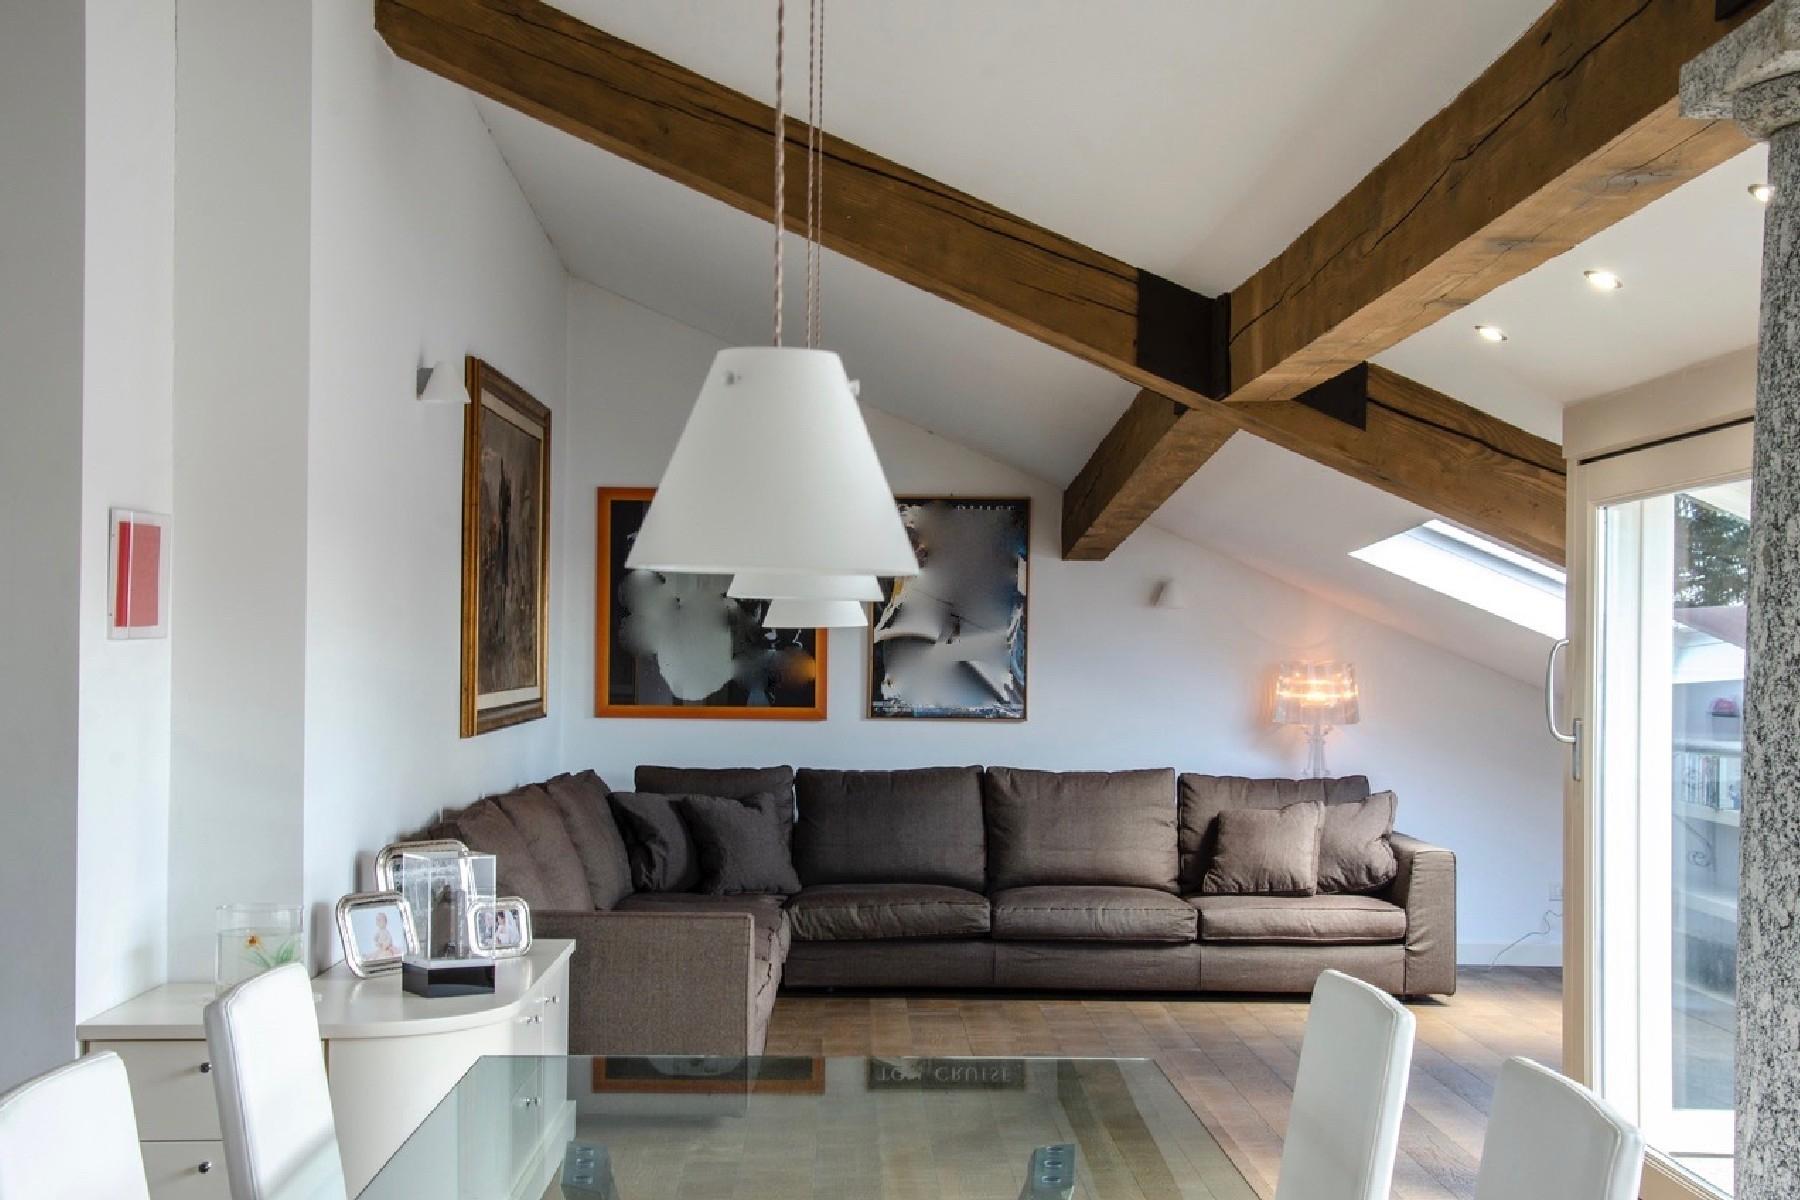 Appartamento in Vendita a Merate: 4 locali, 225 mq - Foto 16